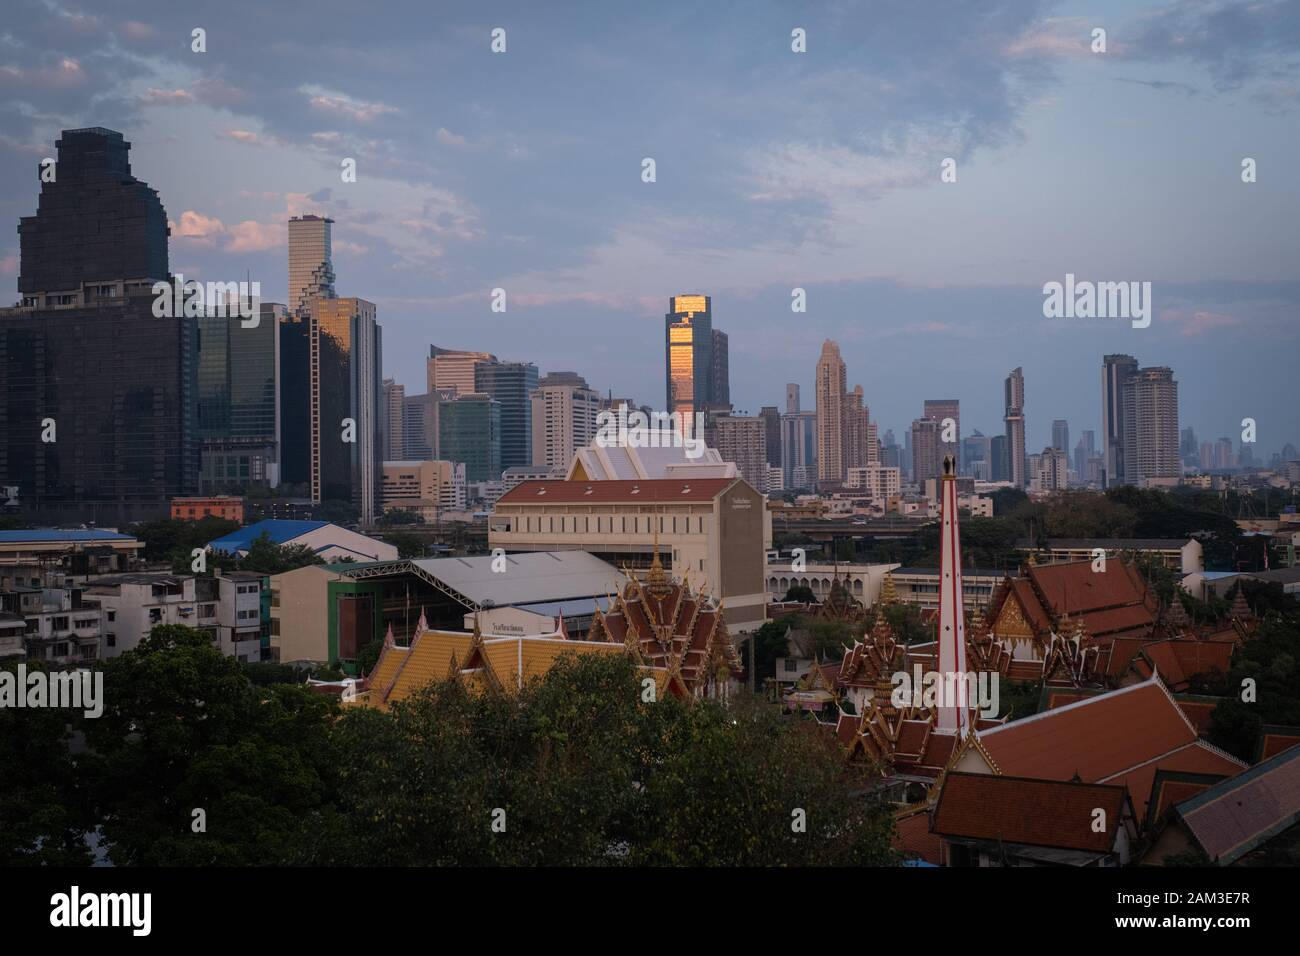 BANGKOK, THAILAND - DECEMBER : Sunset from city rooftop. Stock Photo